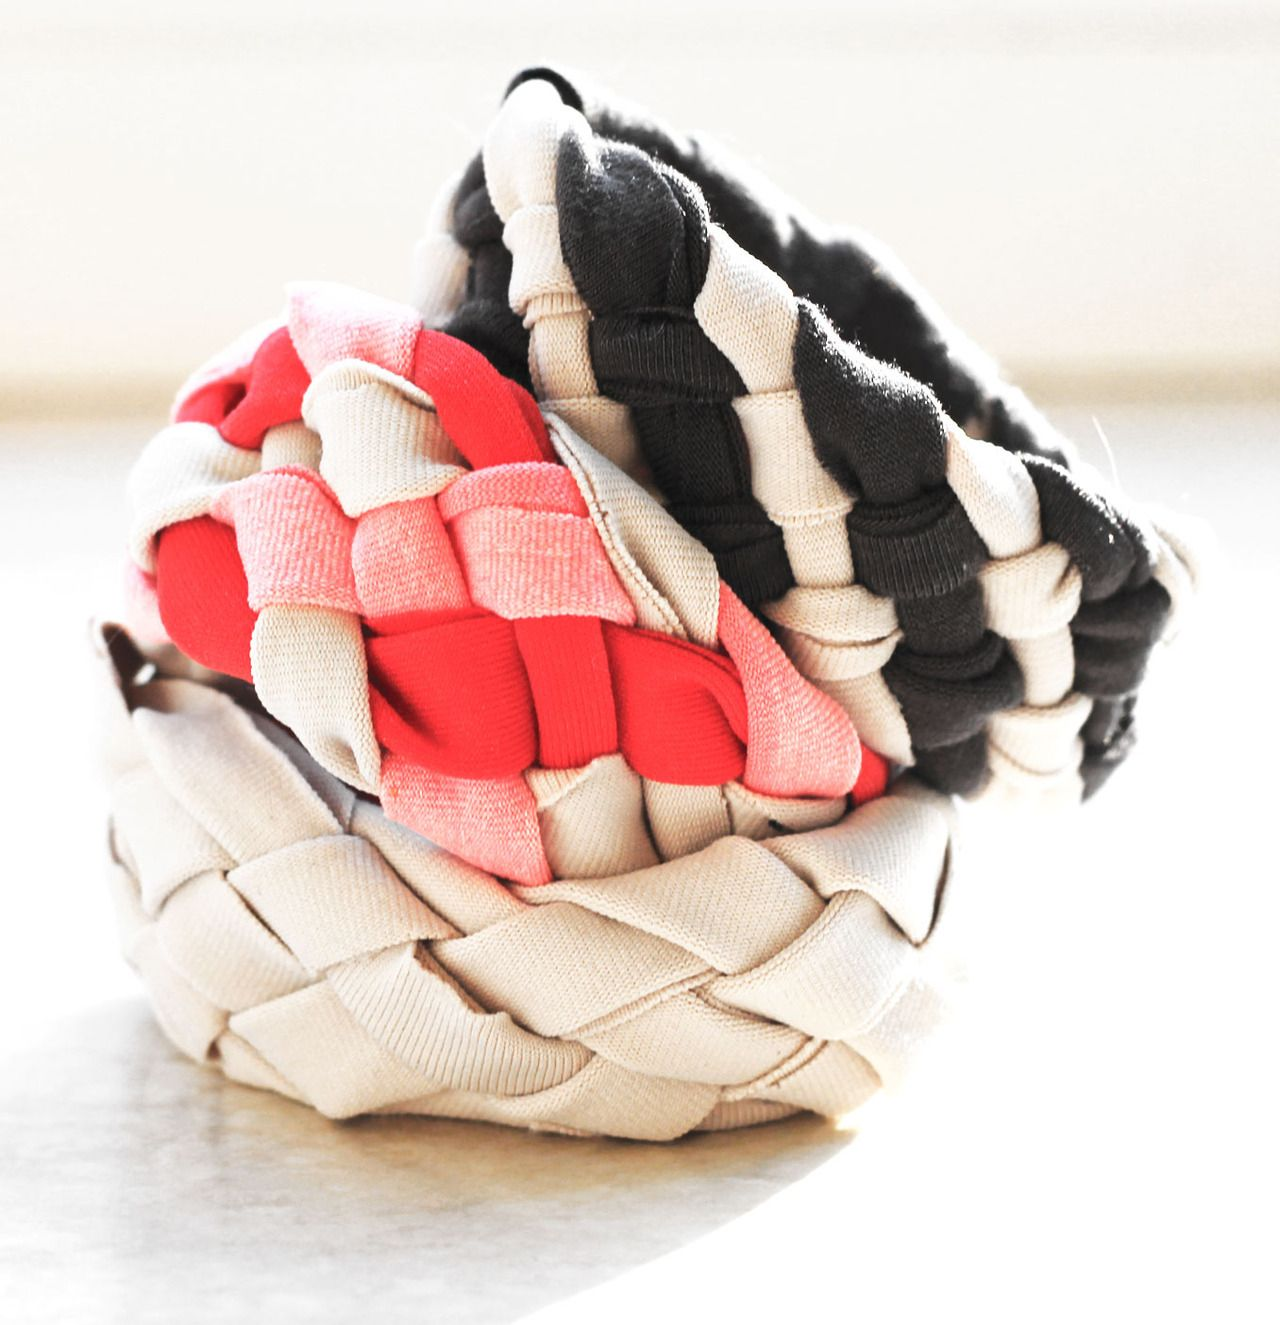 DIY T-Shirt Bracelets.